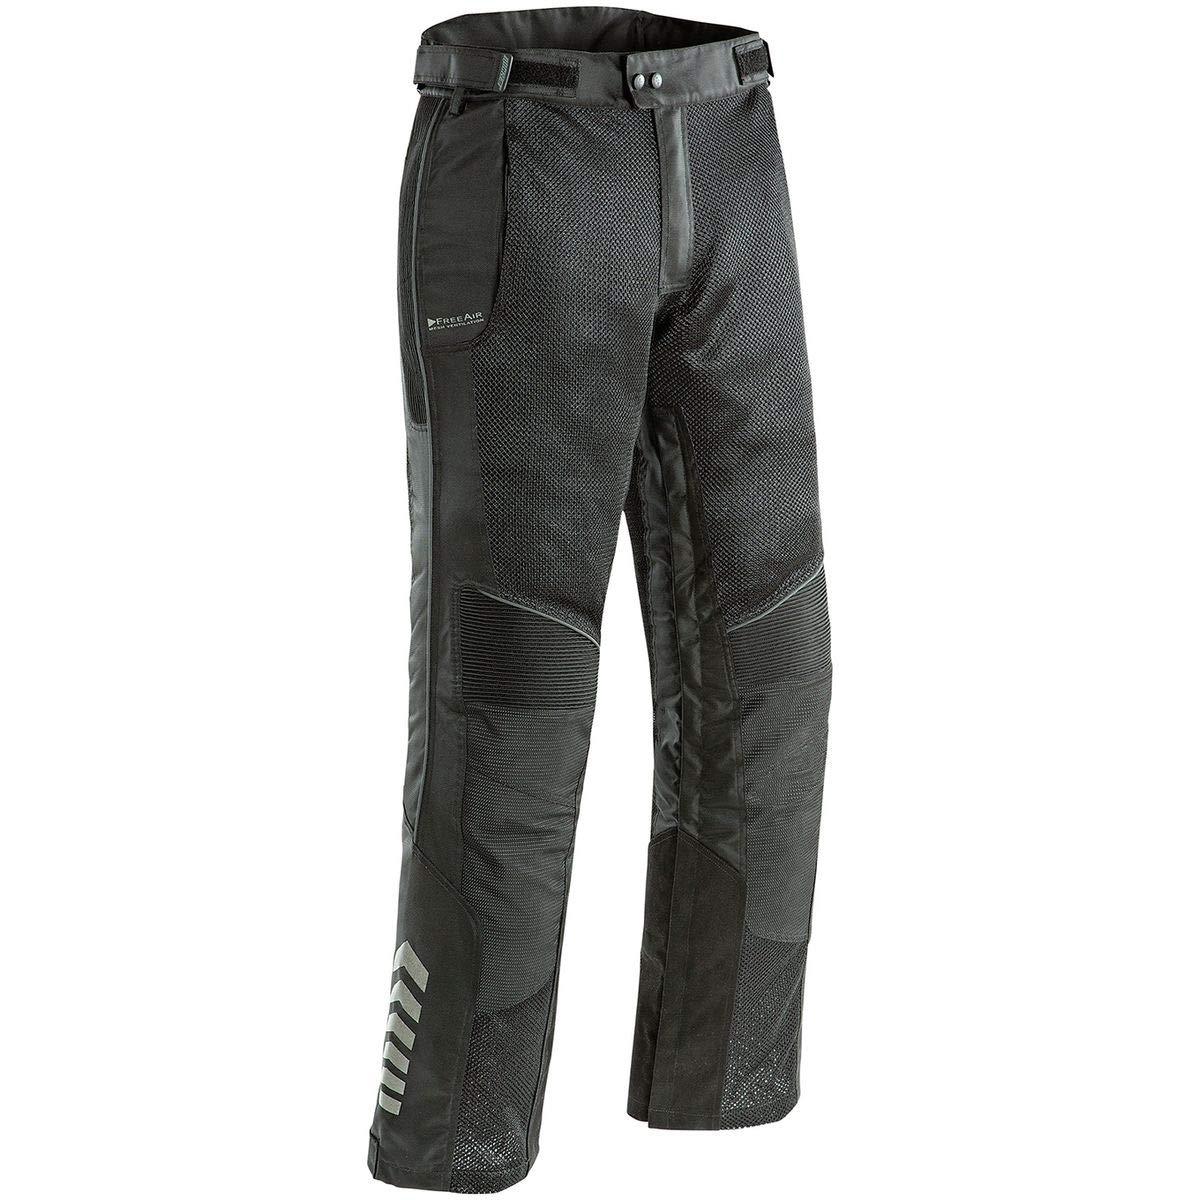 Joe Rocket 1518-3005 Phoenix Ion Men's Mesh Motorcycle Pants (Black, X-Large)